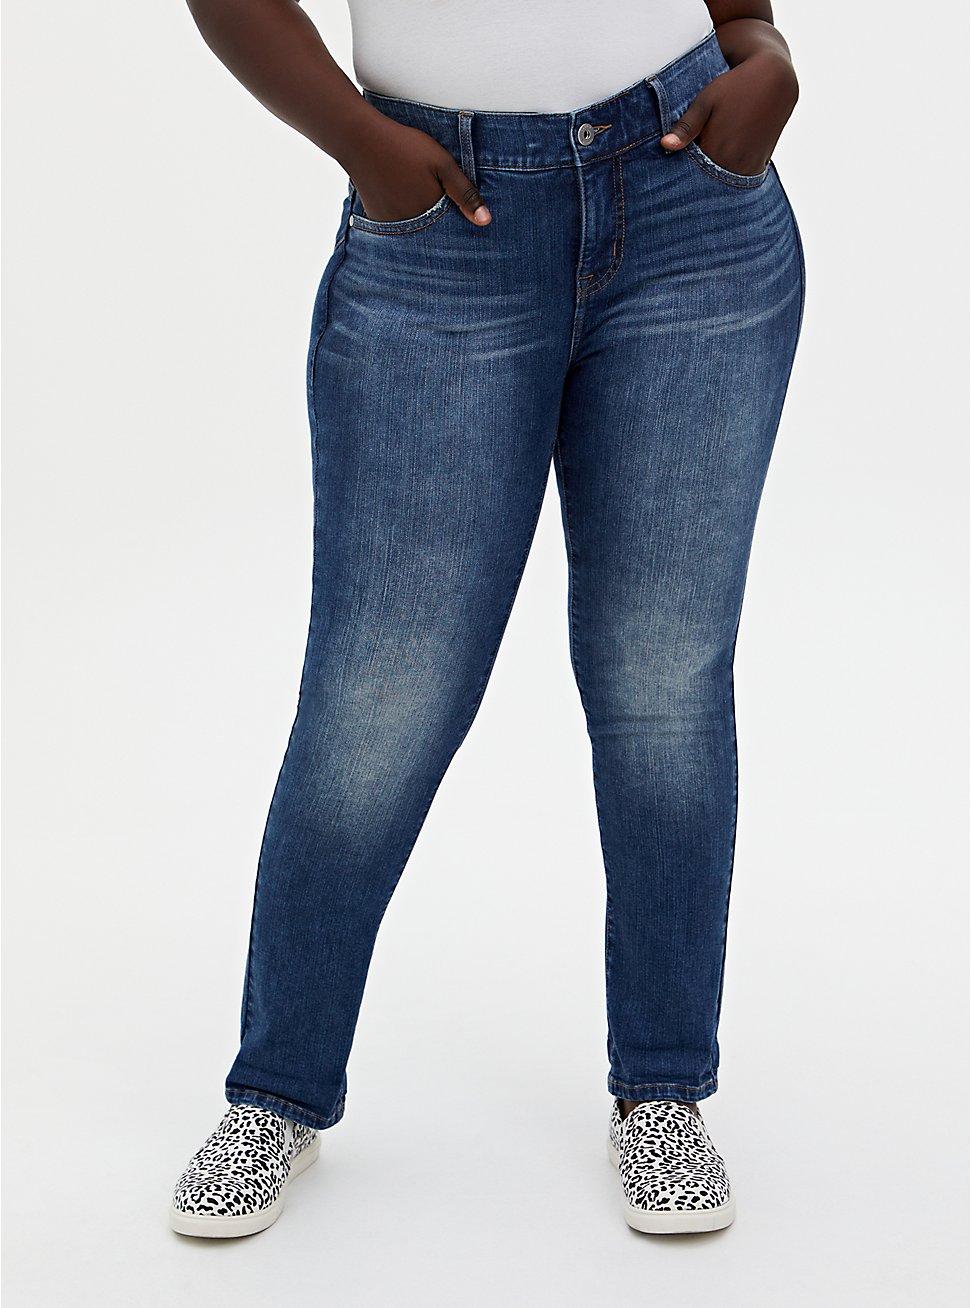 Bombshell Straight Jean - Premium Stretch Medium Wash, , fitModel1-hires